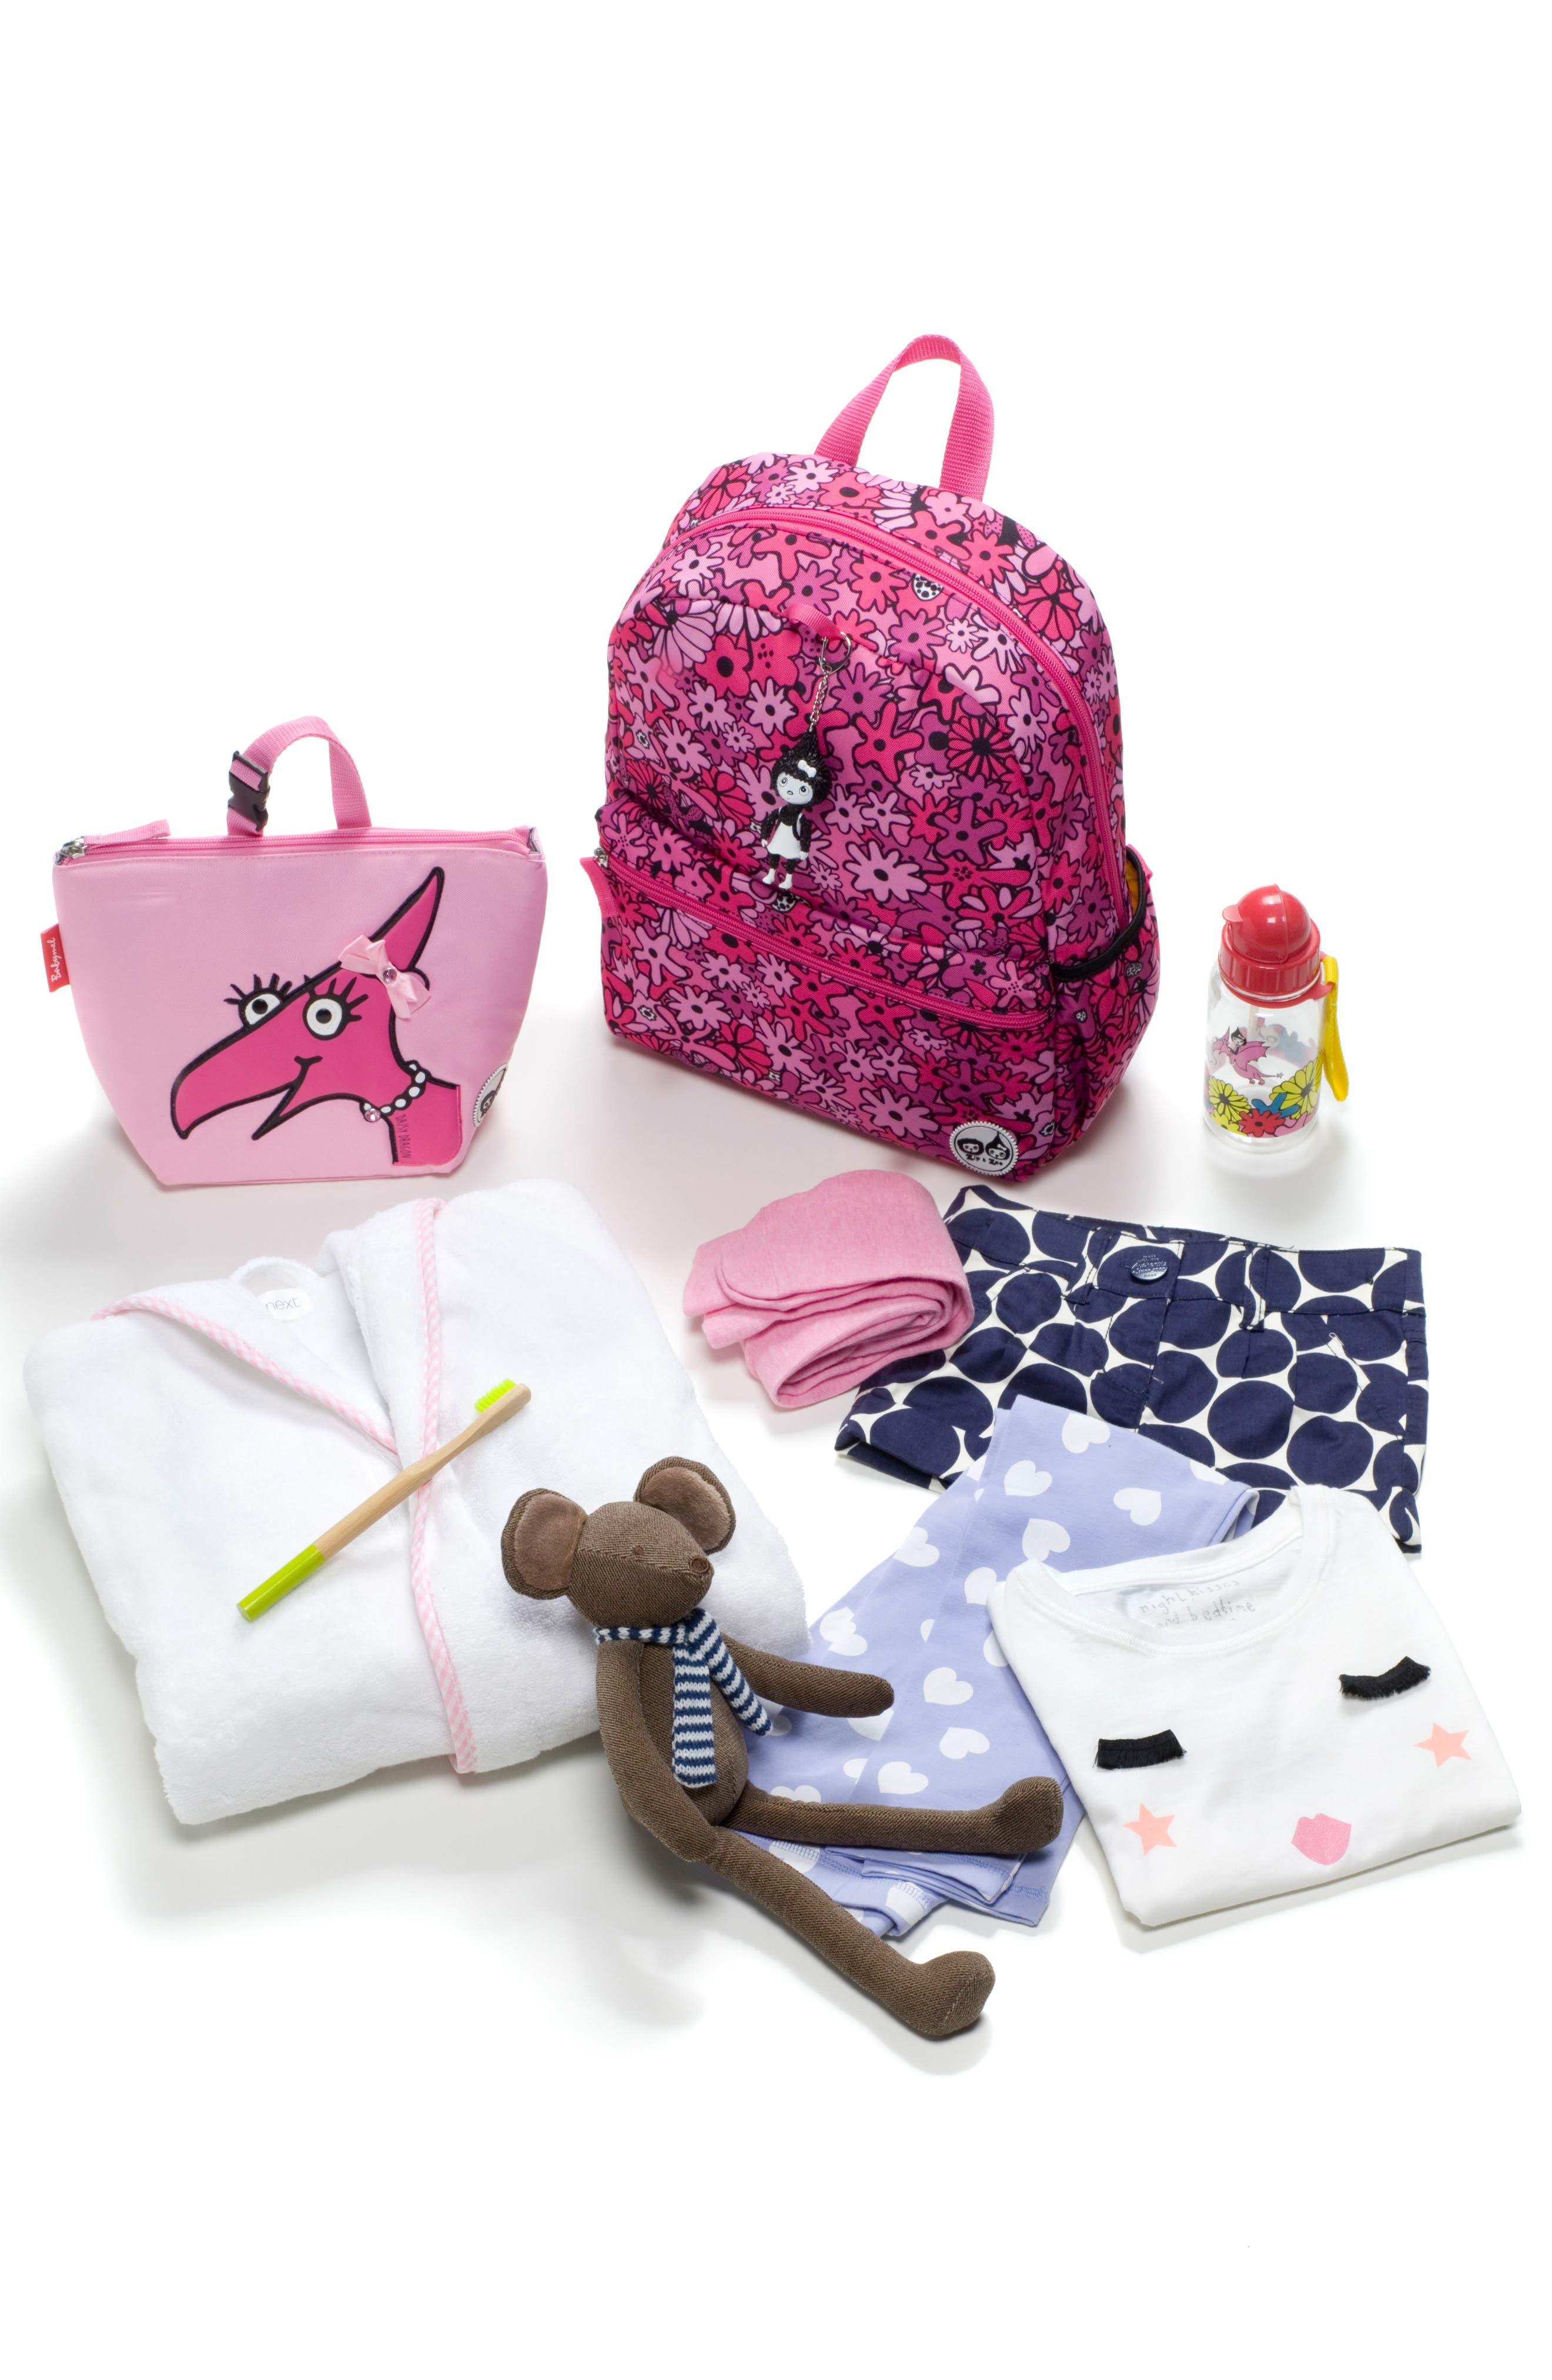 Zip & Zoe Floral Junior Backpack,                             Alternate thumbnail 8, color,                             Floral Pink